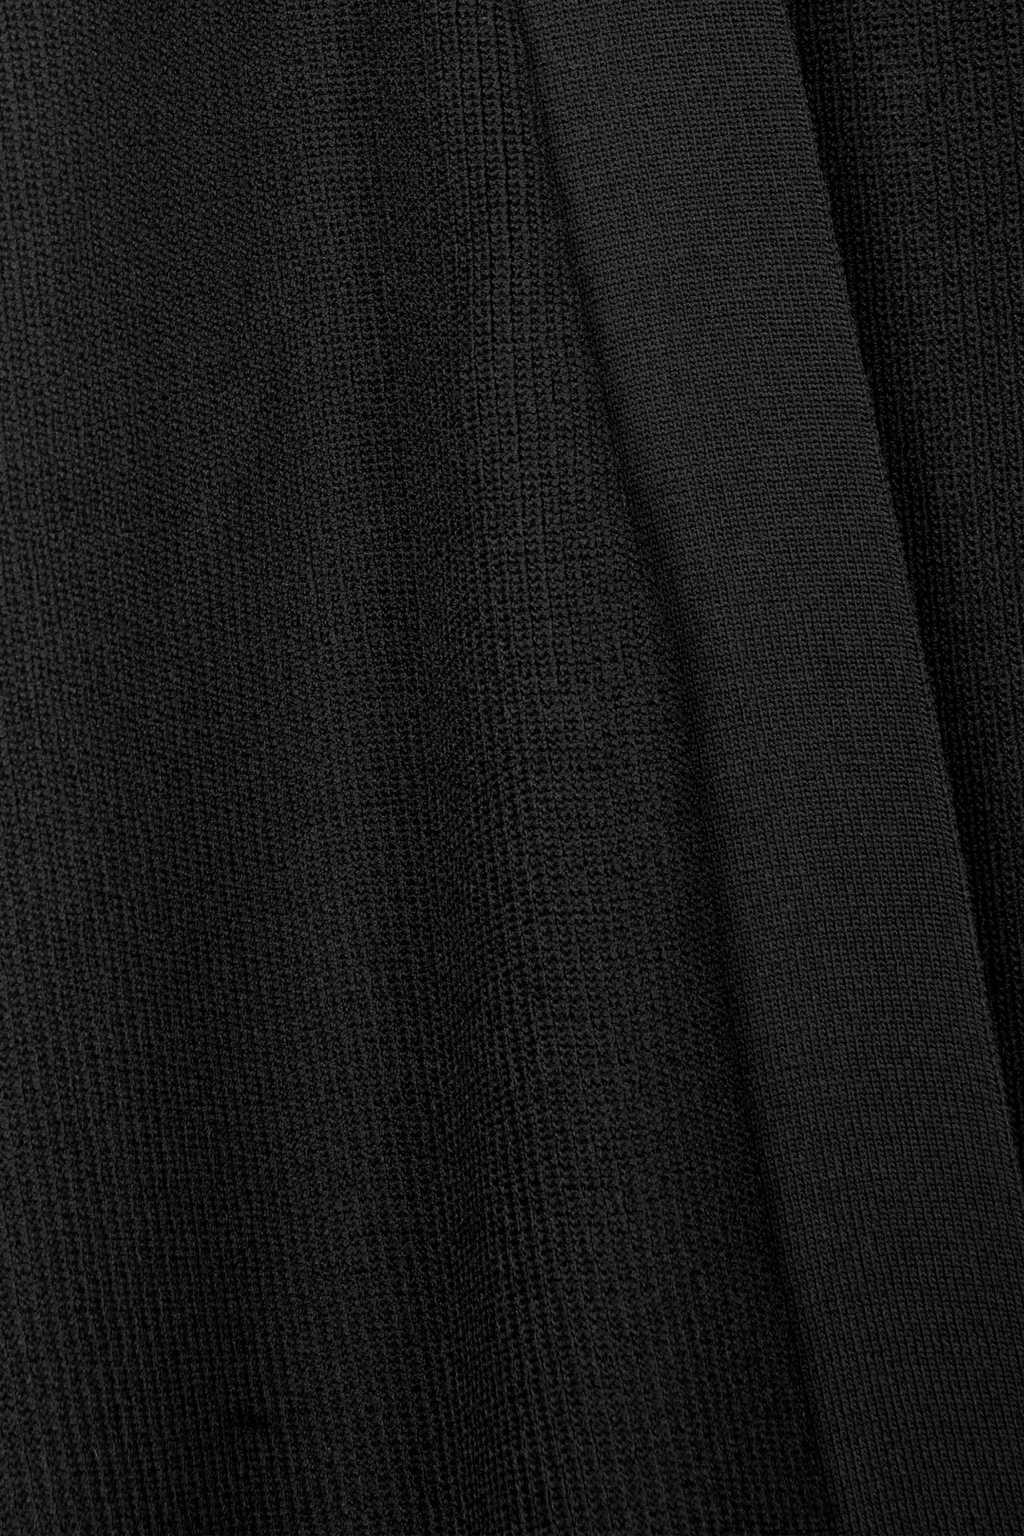 Cardigan 1178 Black 5